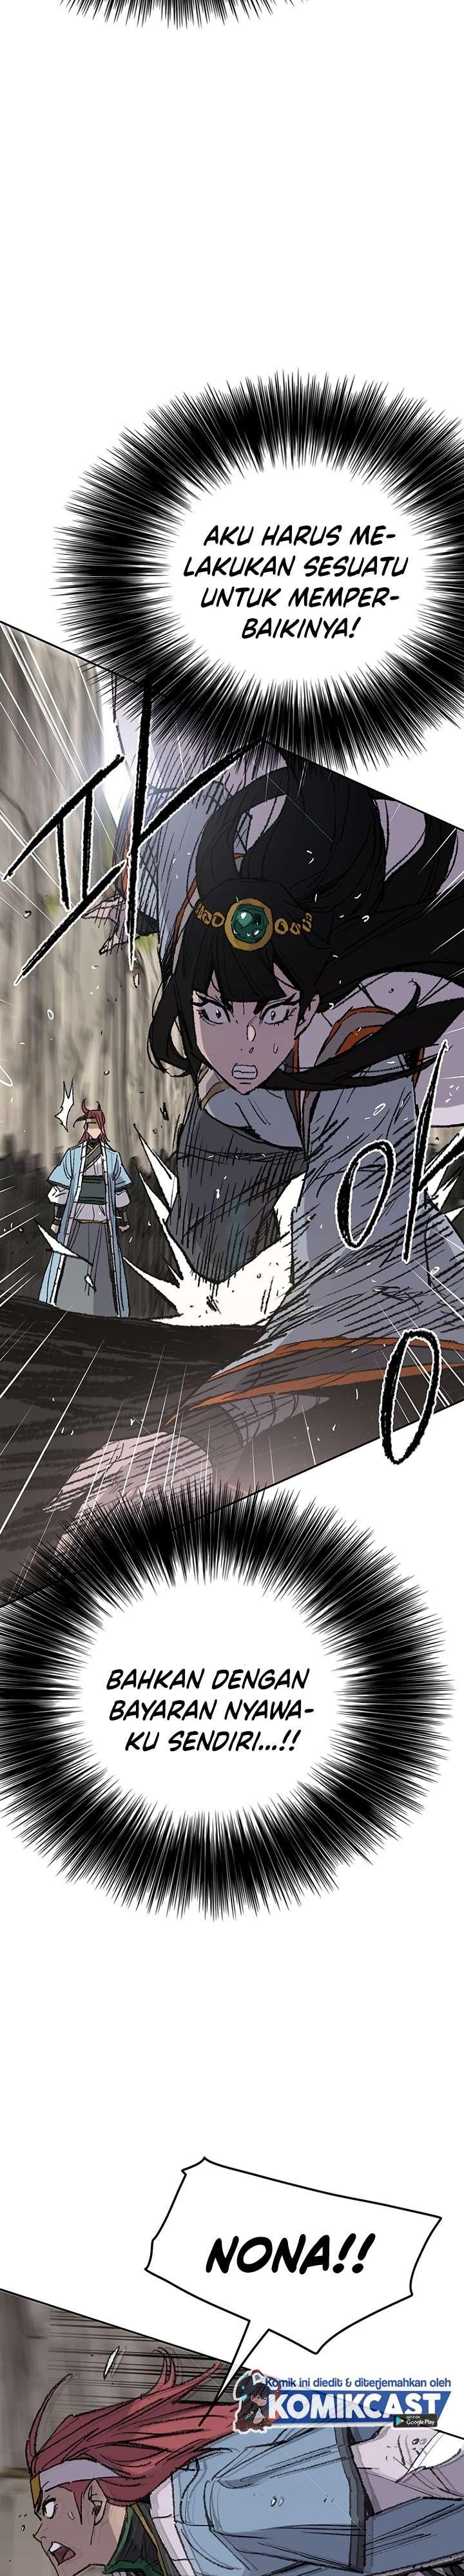 The Undefeatable Swordsman Chapter 66